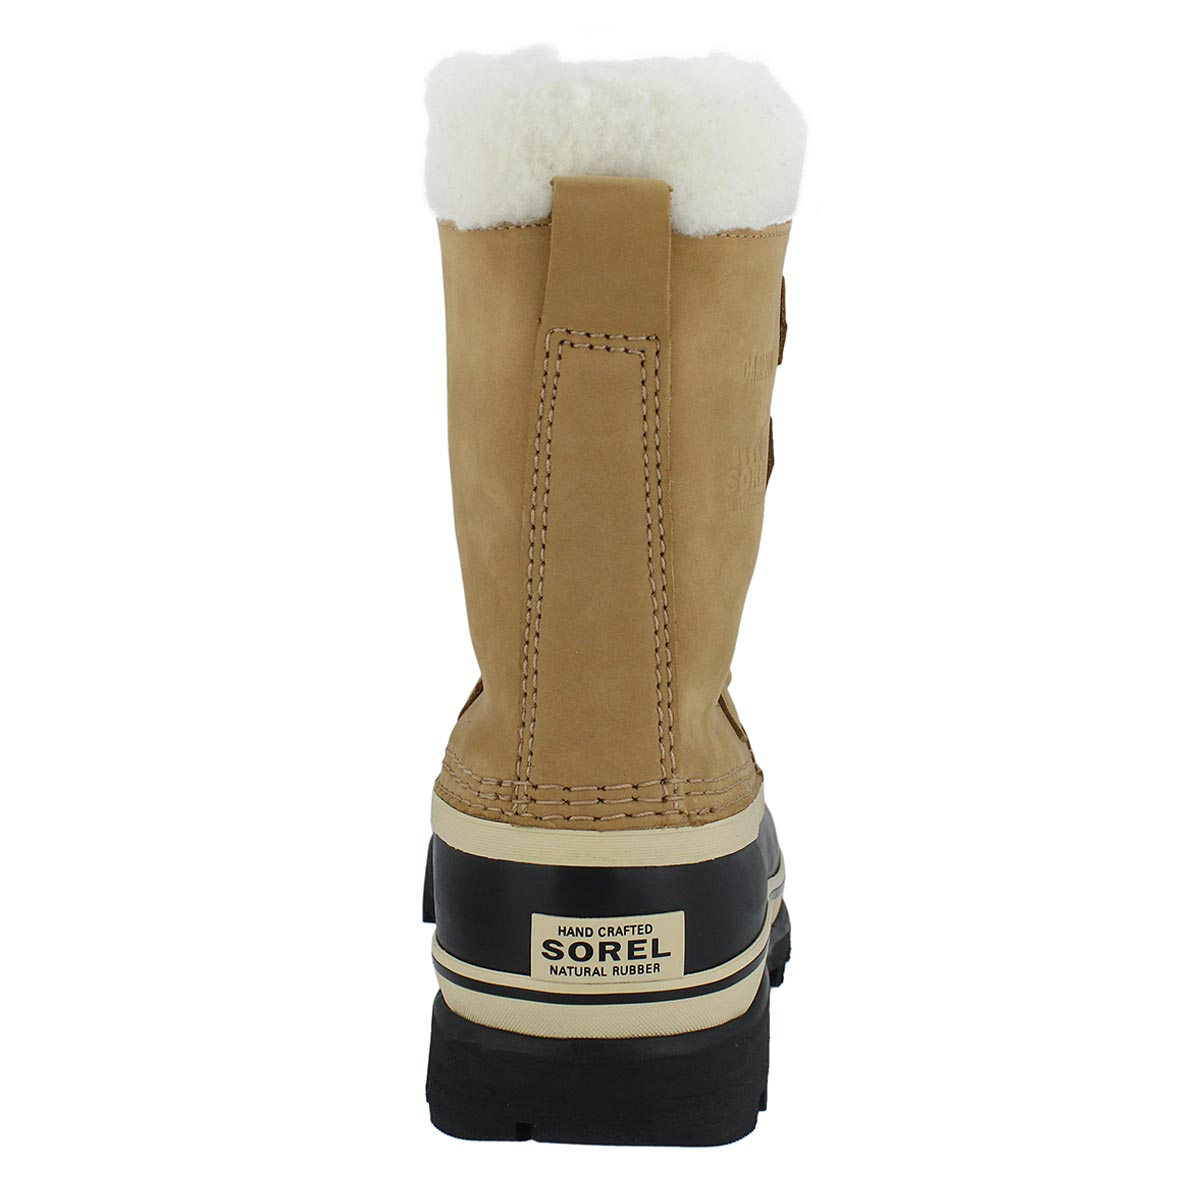 Lds Caribou buff wtpf winter boot